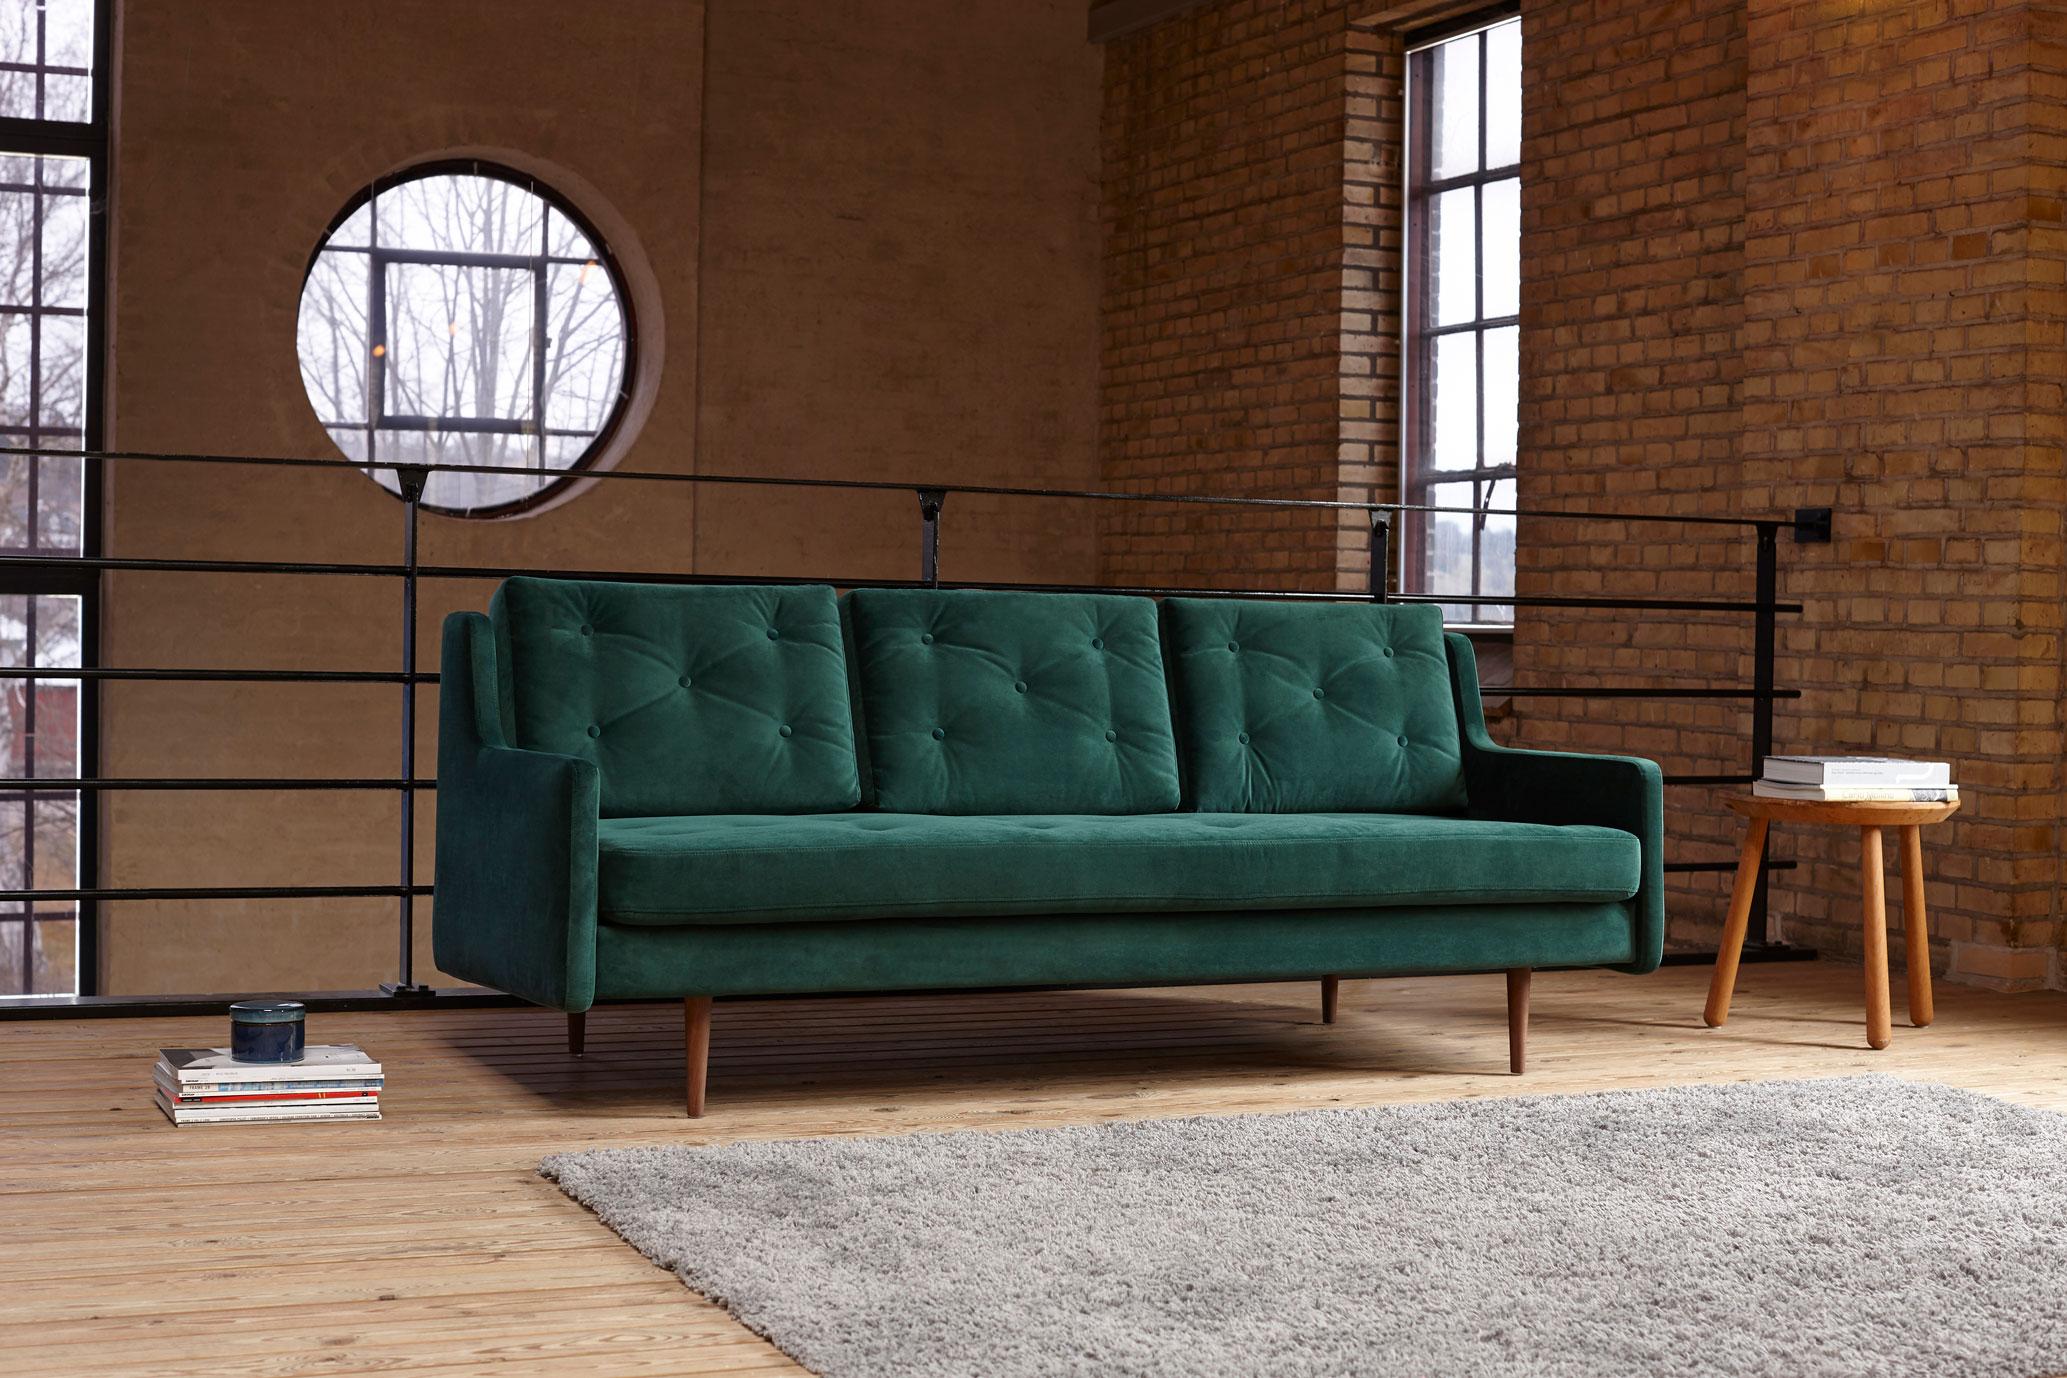 holme-sofa-oliver-lukas-weisskrogh-7.jpg